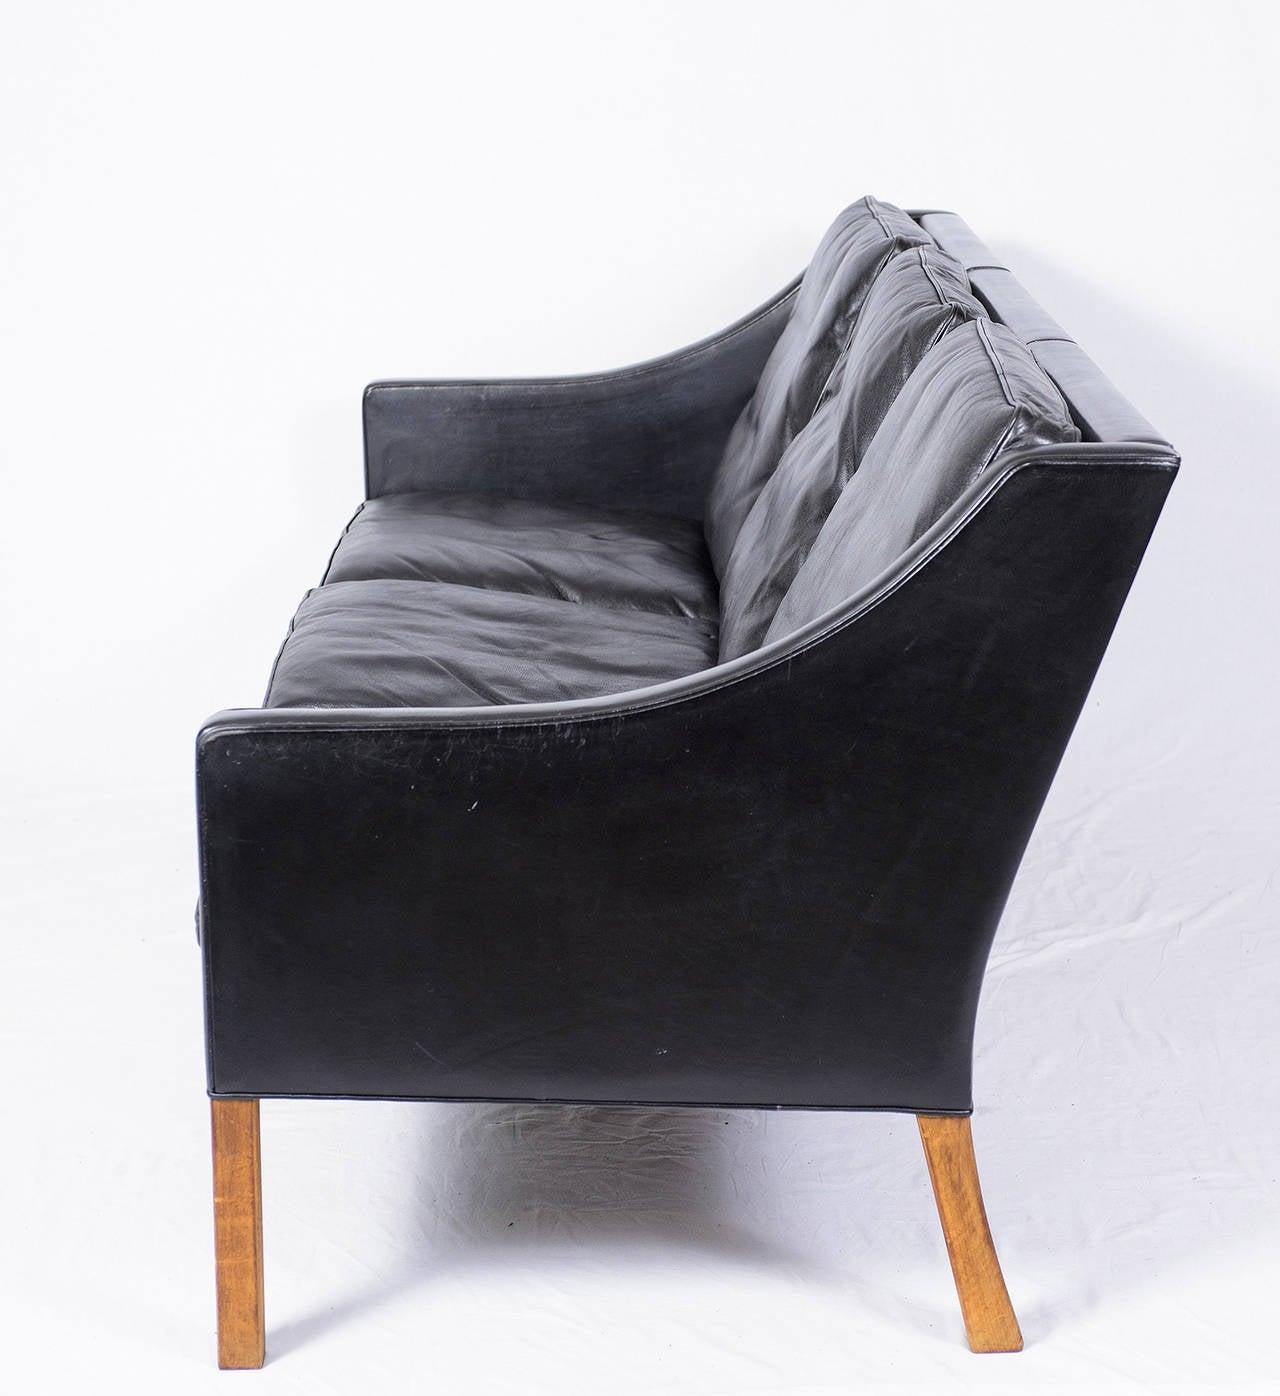 borge mogensen sofa model 2209 outlet sofas børge three seat leather at 1stdibs